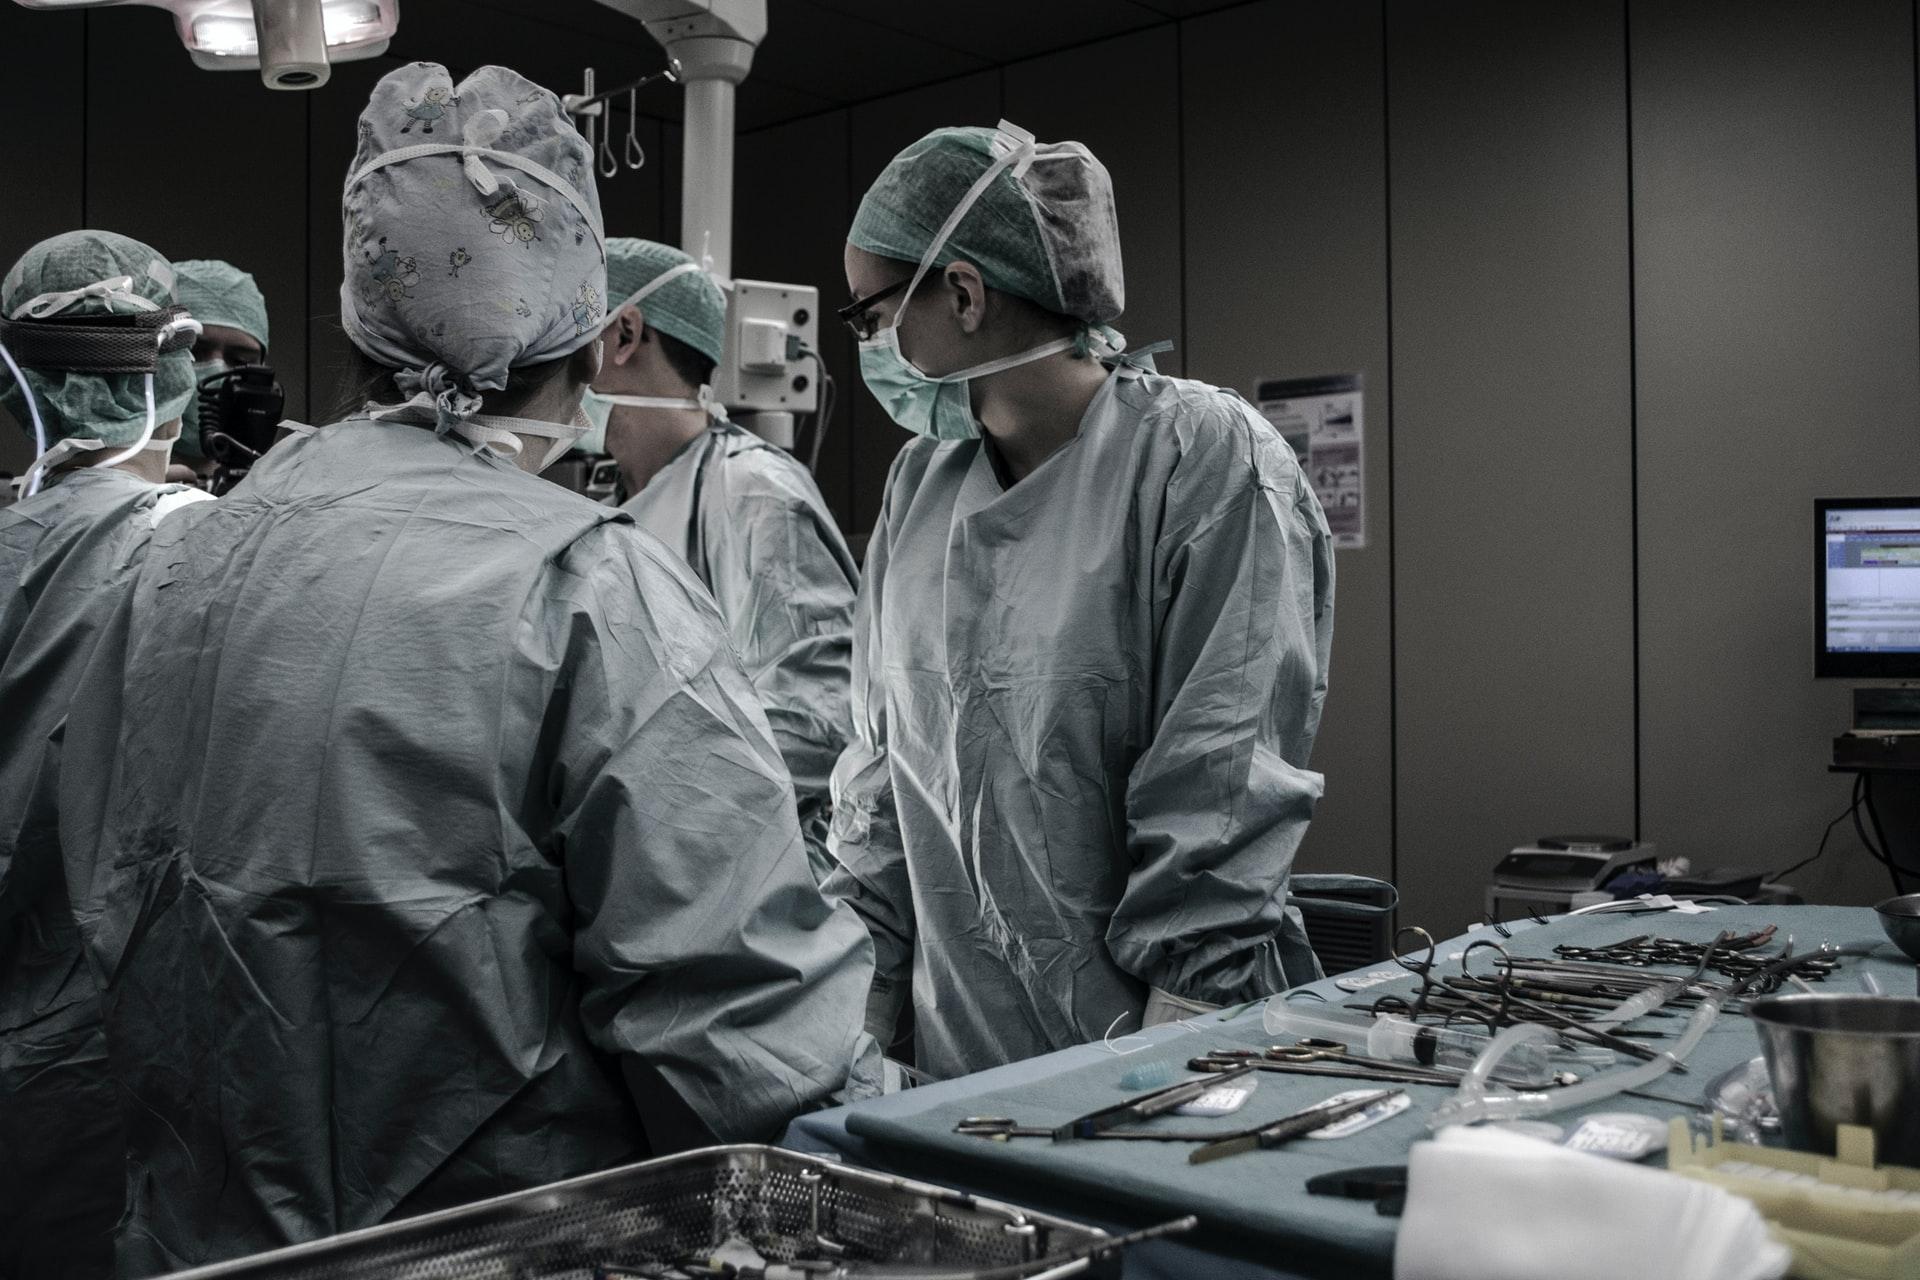 Hospitals in Lebanon struggle to care for explosion survivors